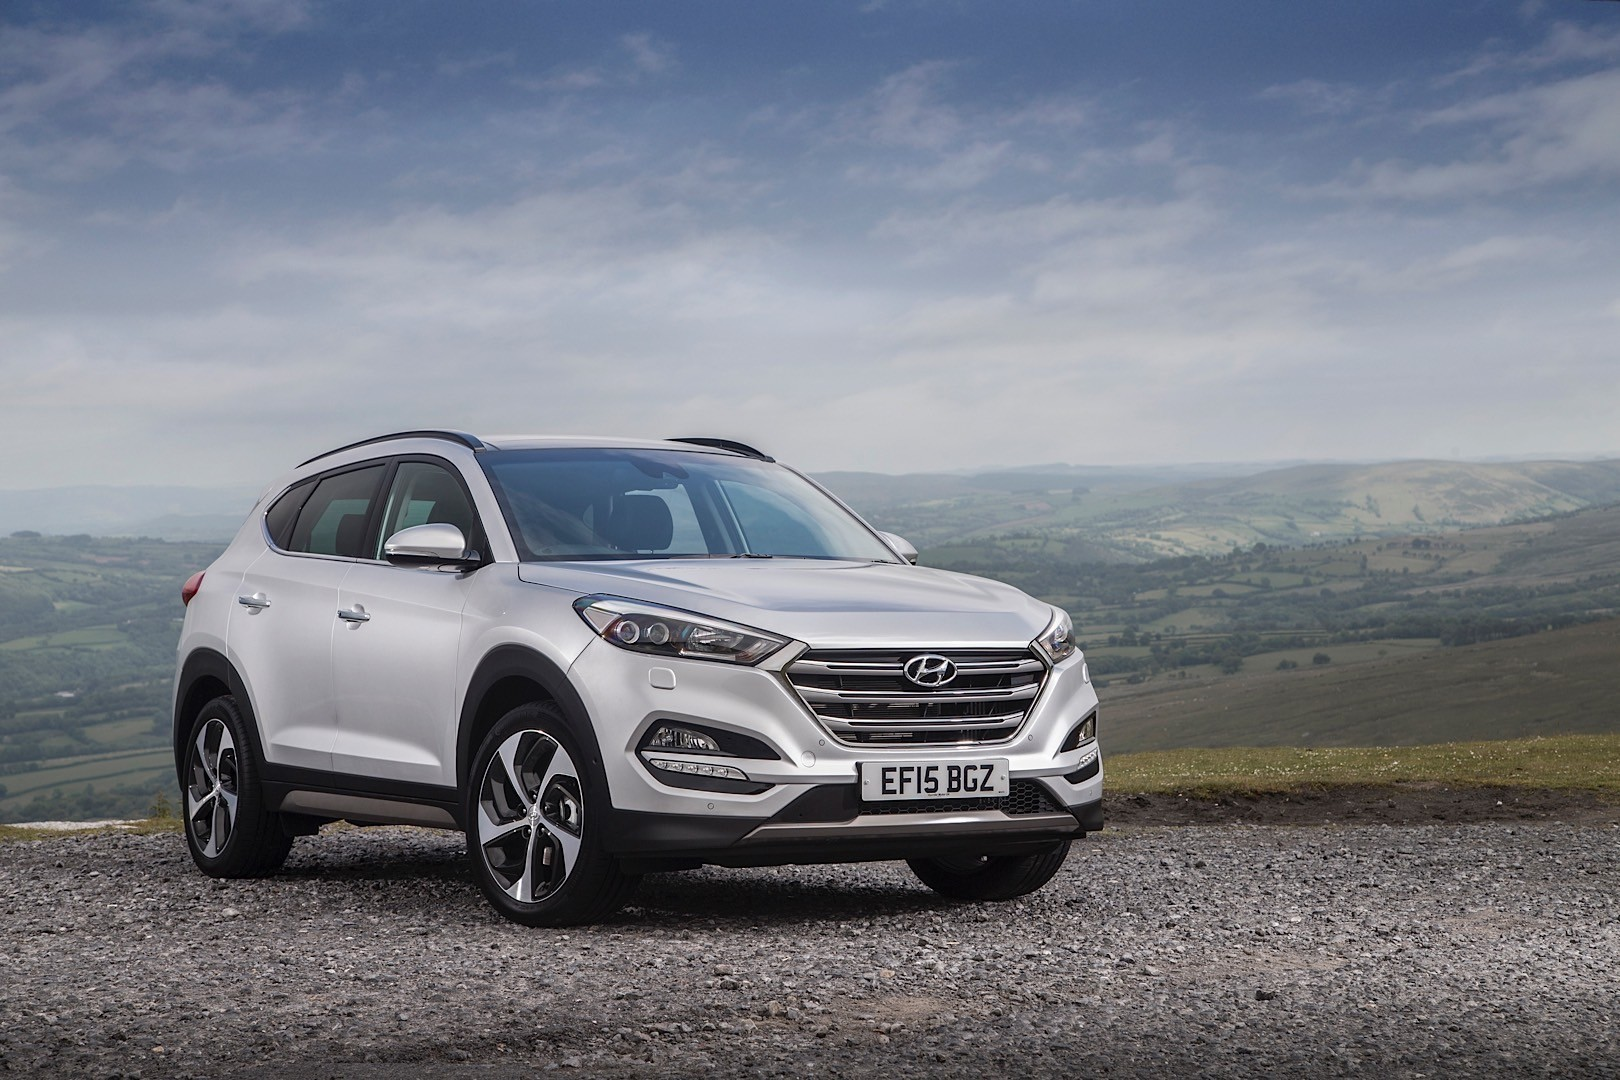 2016 Hyundai Tucson UK Pricing Info Revealed SUV Bill